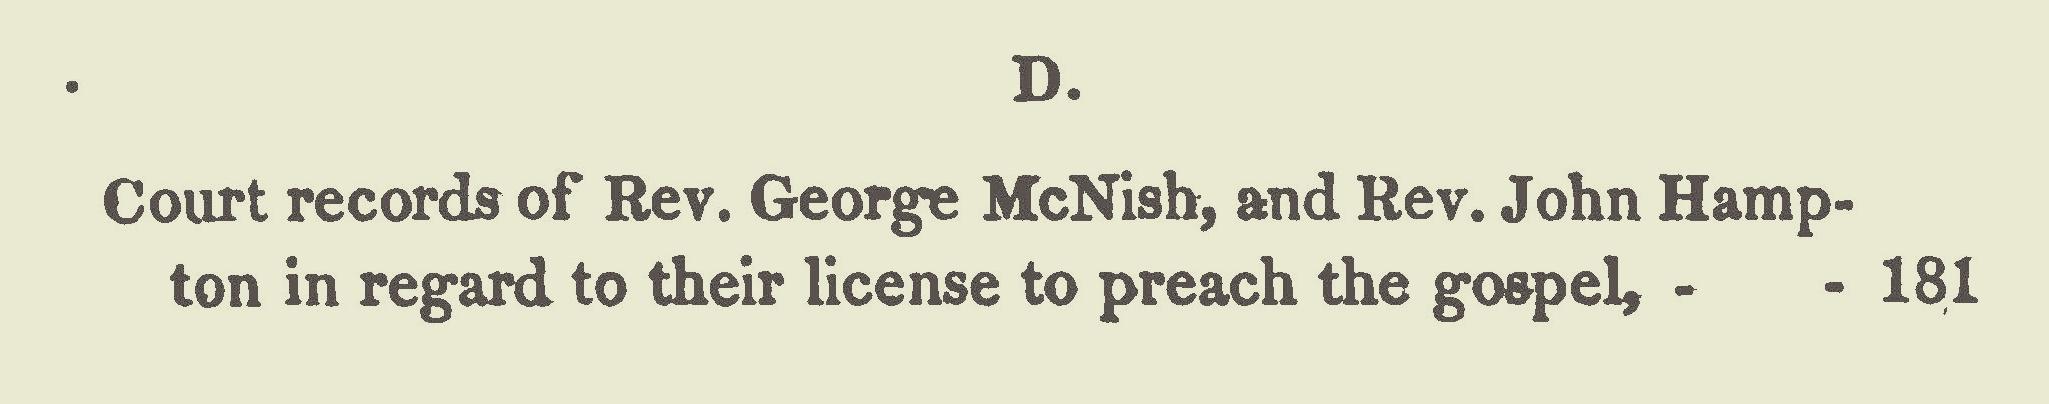 Hampton, John, Petition to Take Dissenting Oath Title Page.jpg